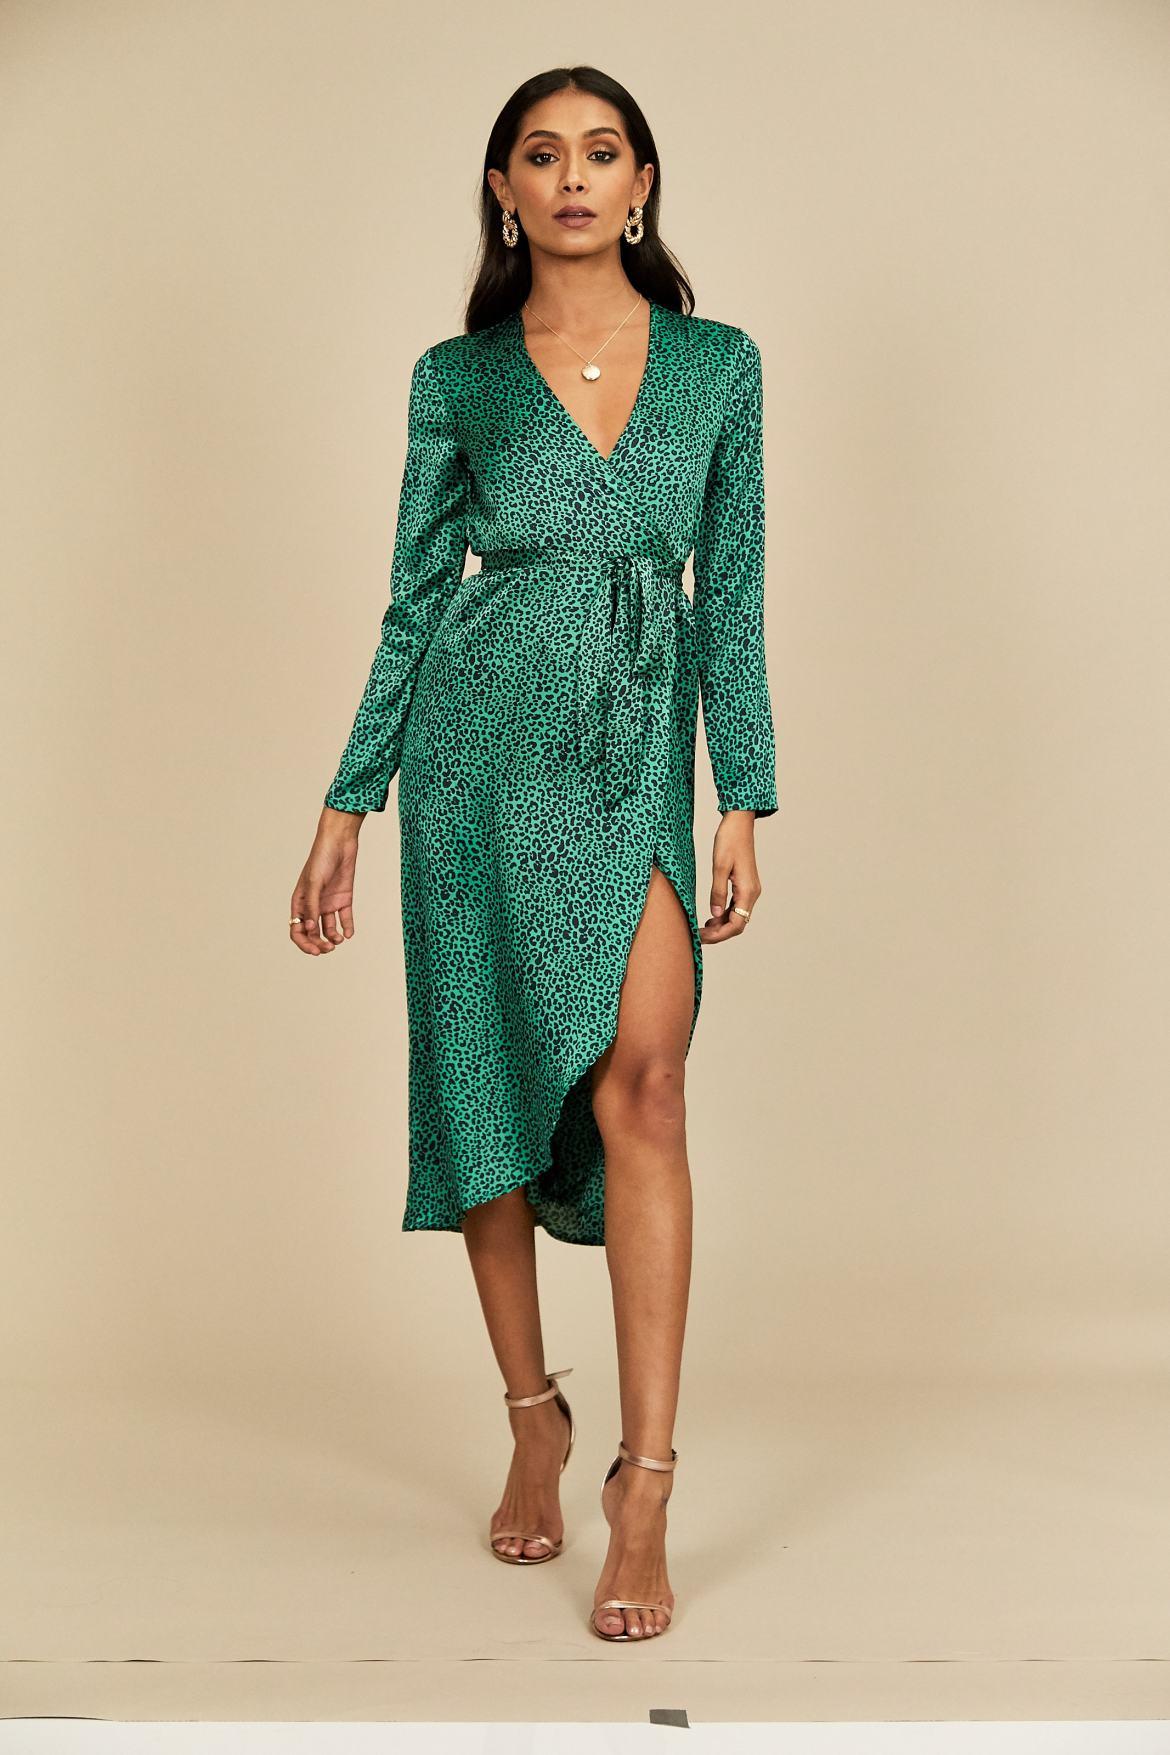 Model wears a green satin wrap midi dress with animal print